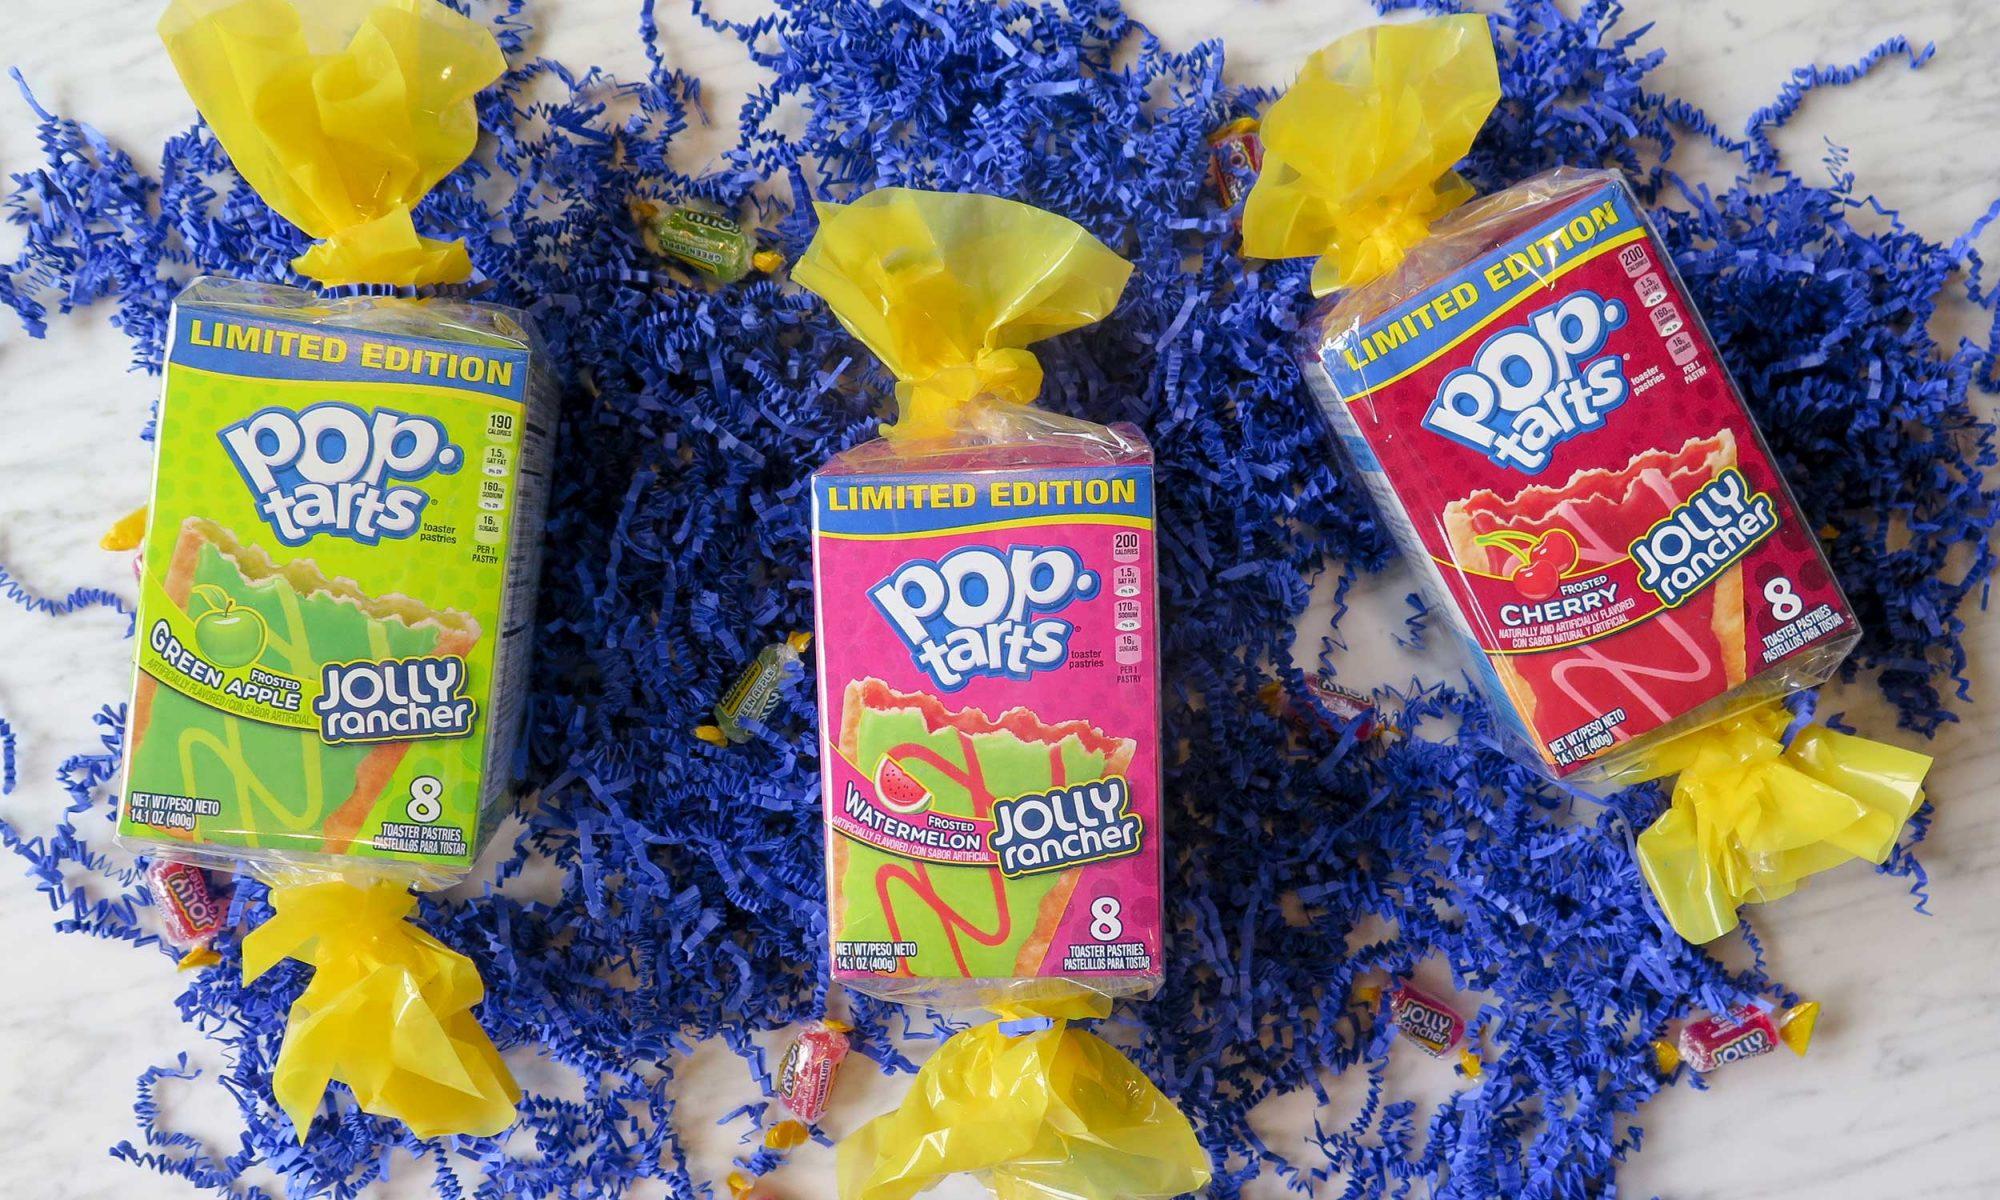 EC: Jolly Rancher Pop-Tarts Taste Just Like Jolly Ranchers